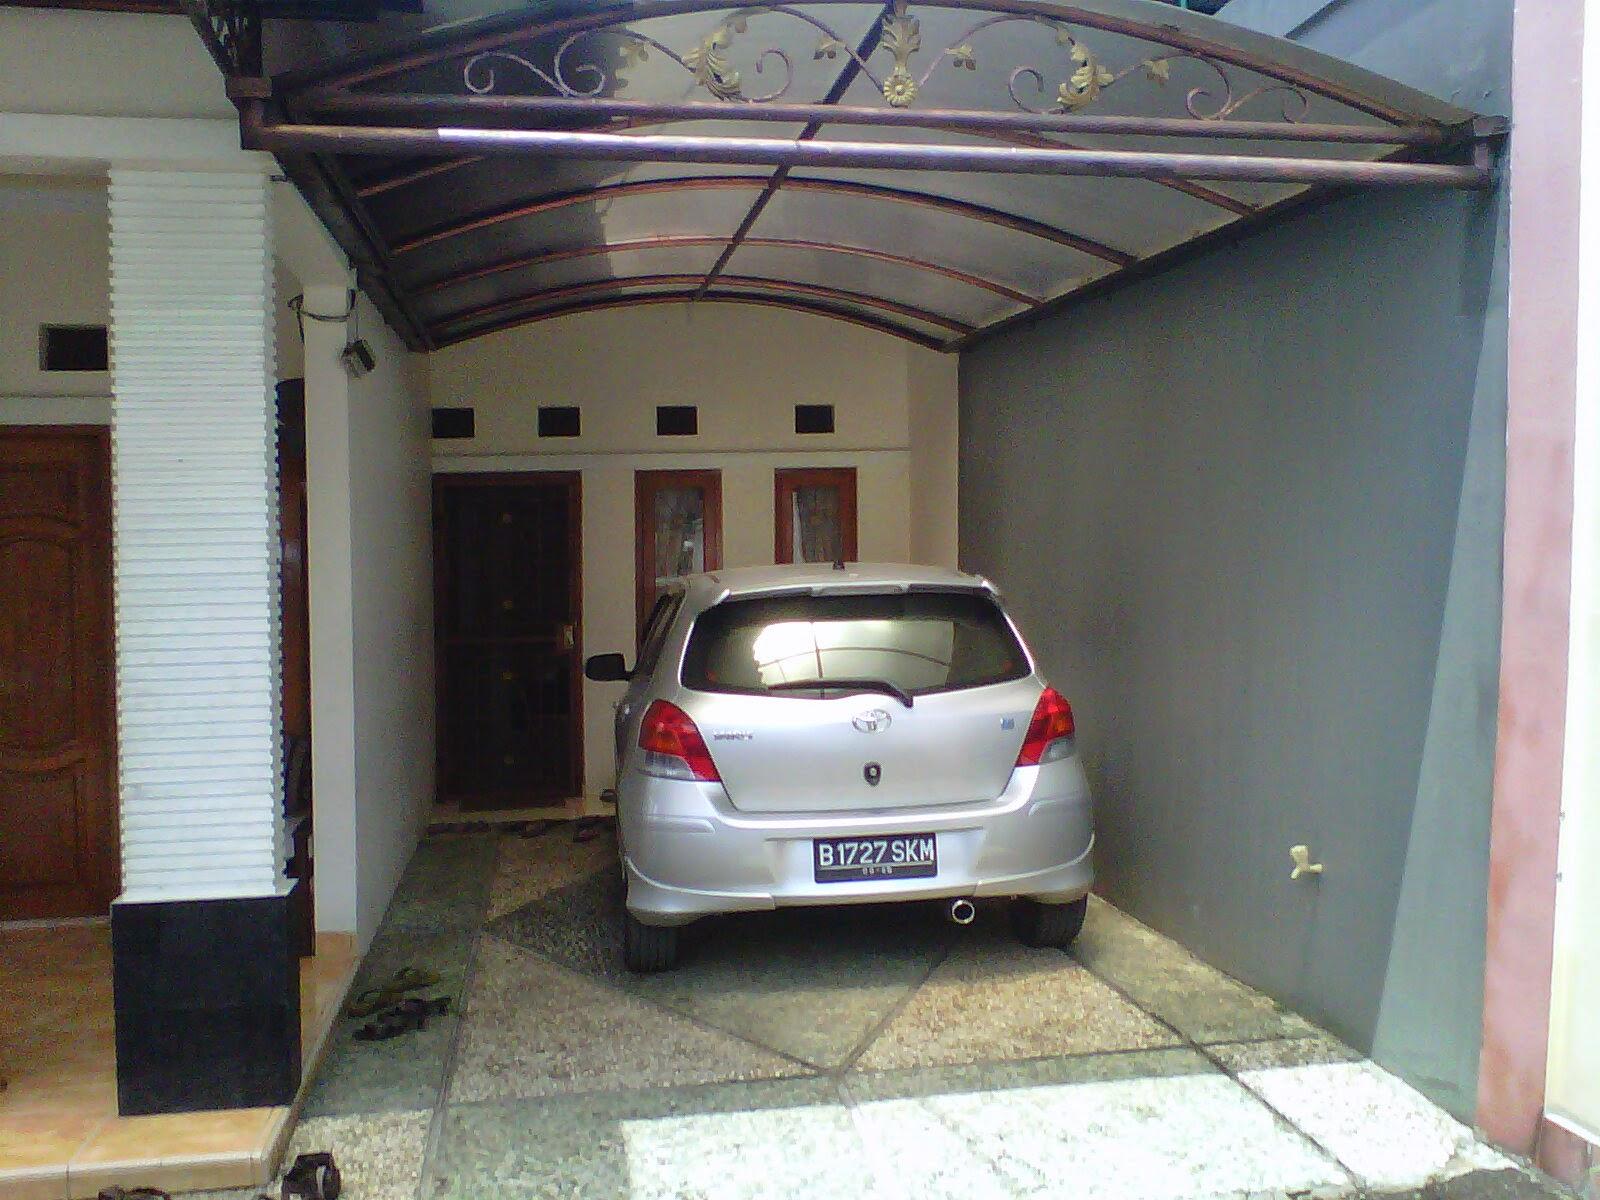 Desain Garasi Rumah Anda & Desain Garasi Rumah Anda   Desain Properti Indonesia